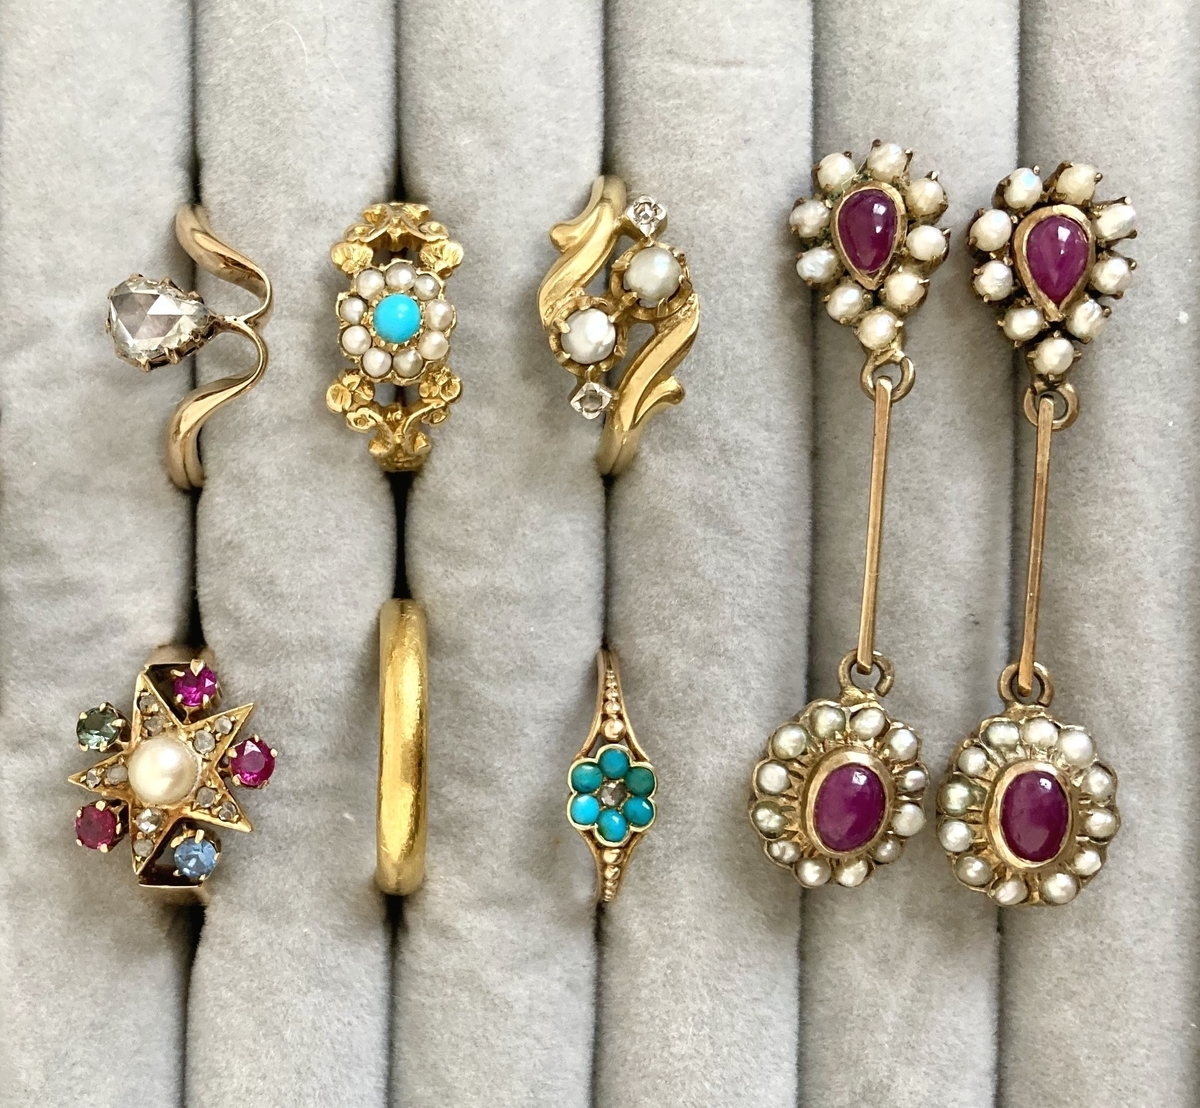 f:id:jewellerywanderlust:20210329202114j:plain